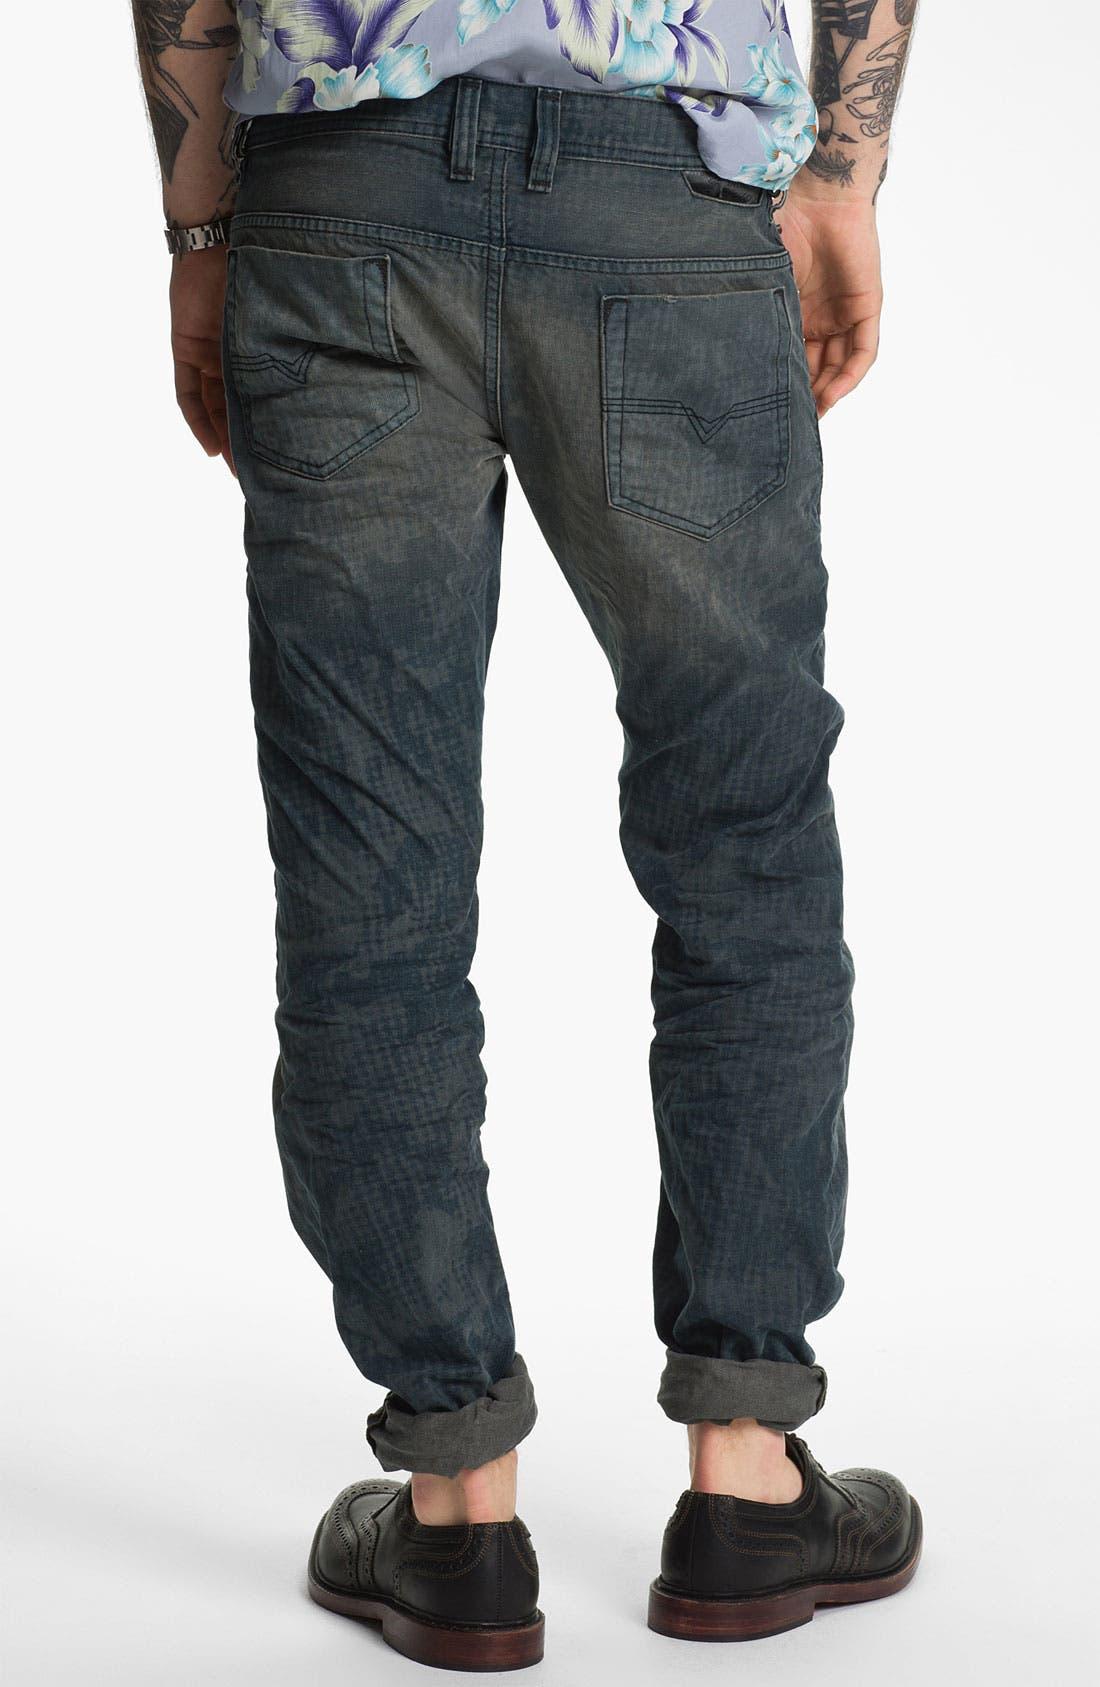 Alternate Image 1 Selected - DIESEL® 'Safado' Straight Leg Jeans (Electric Blue)